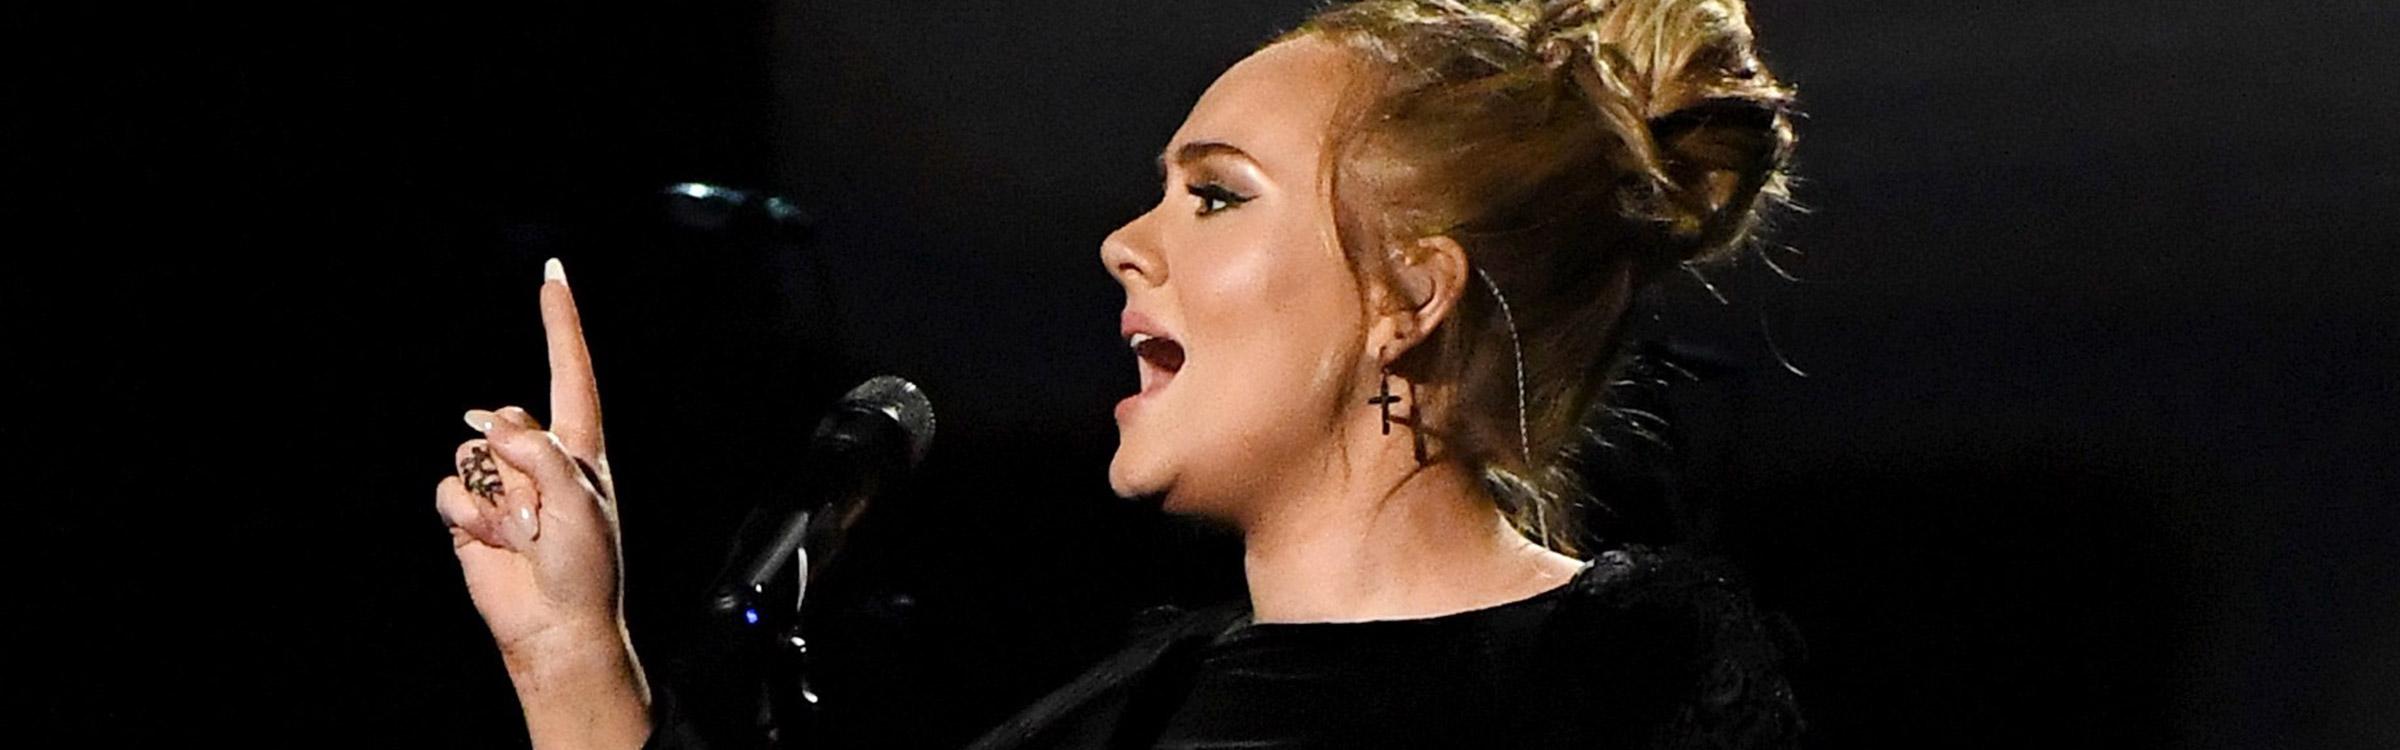 Adele headerafbeelding